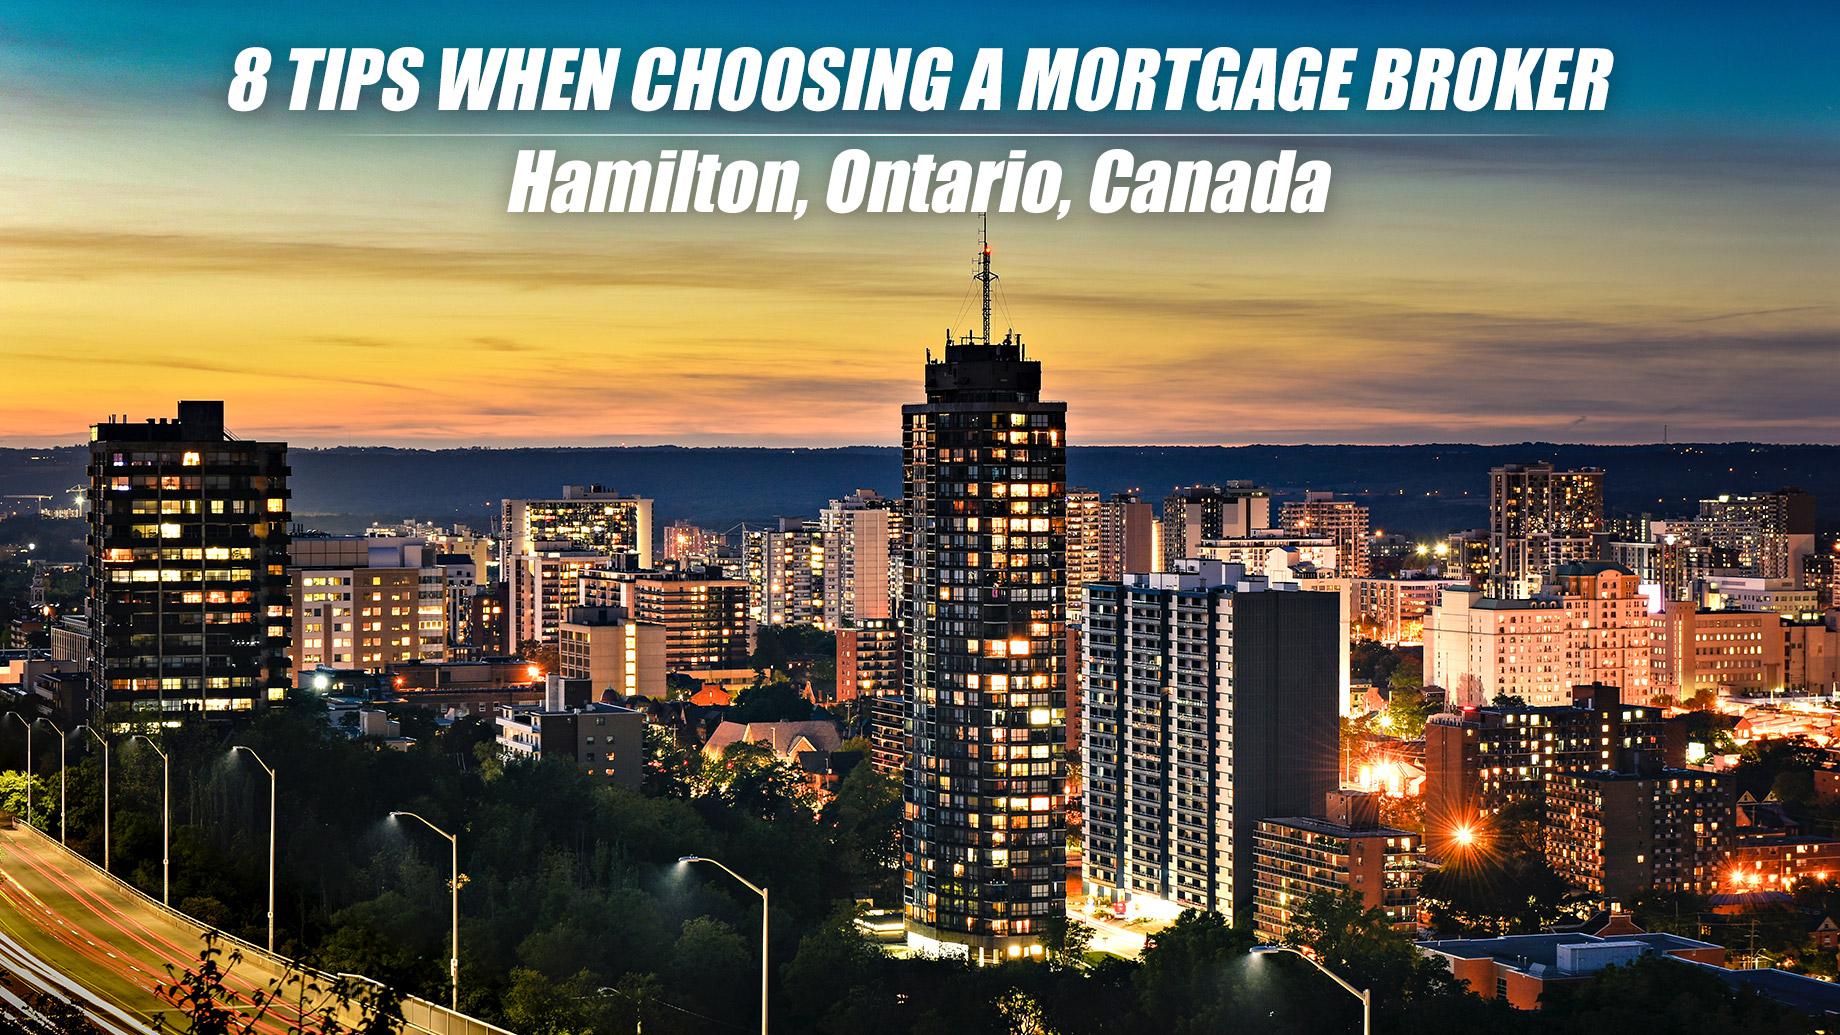 8 Tips When Choosing A Mortgage Broker In Hamilton, Ontario, Canada